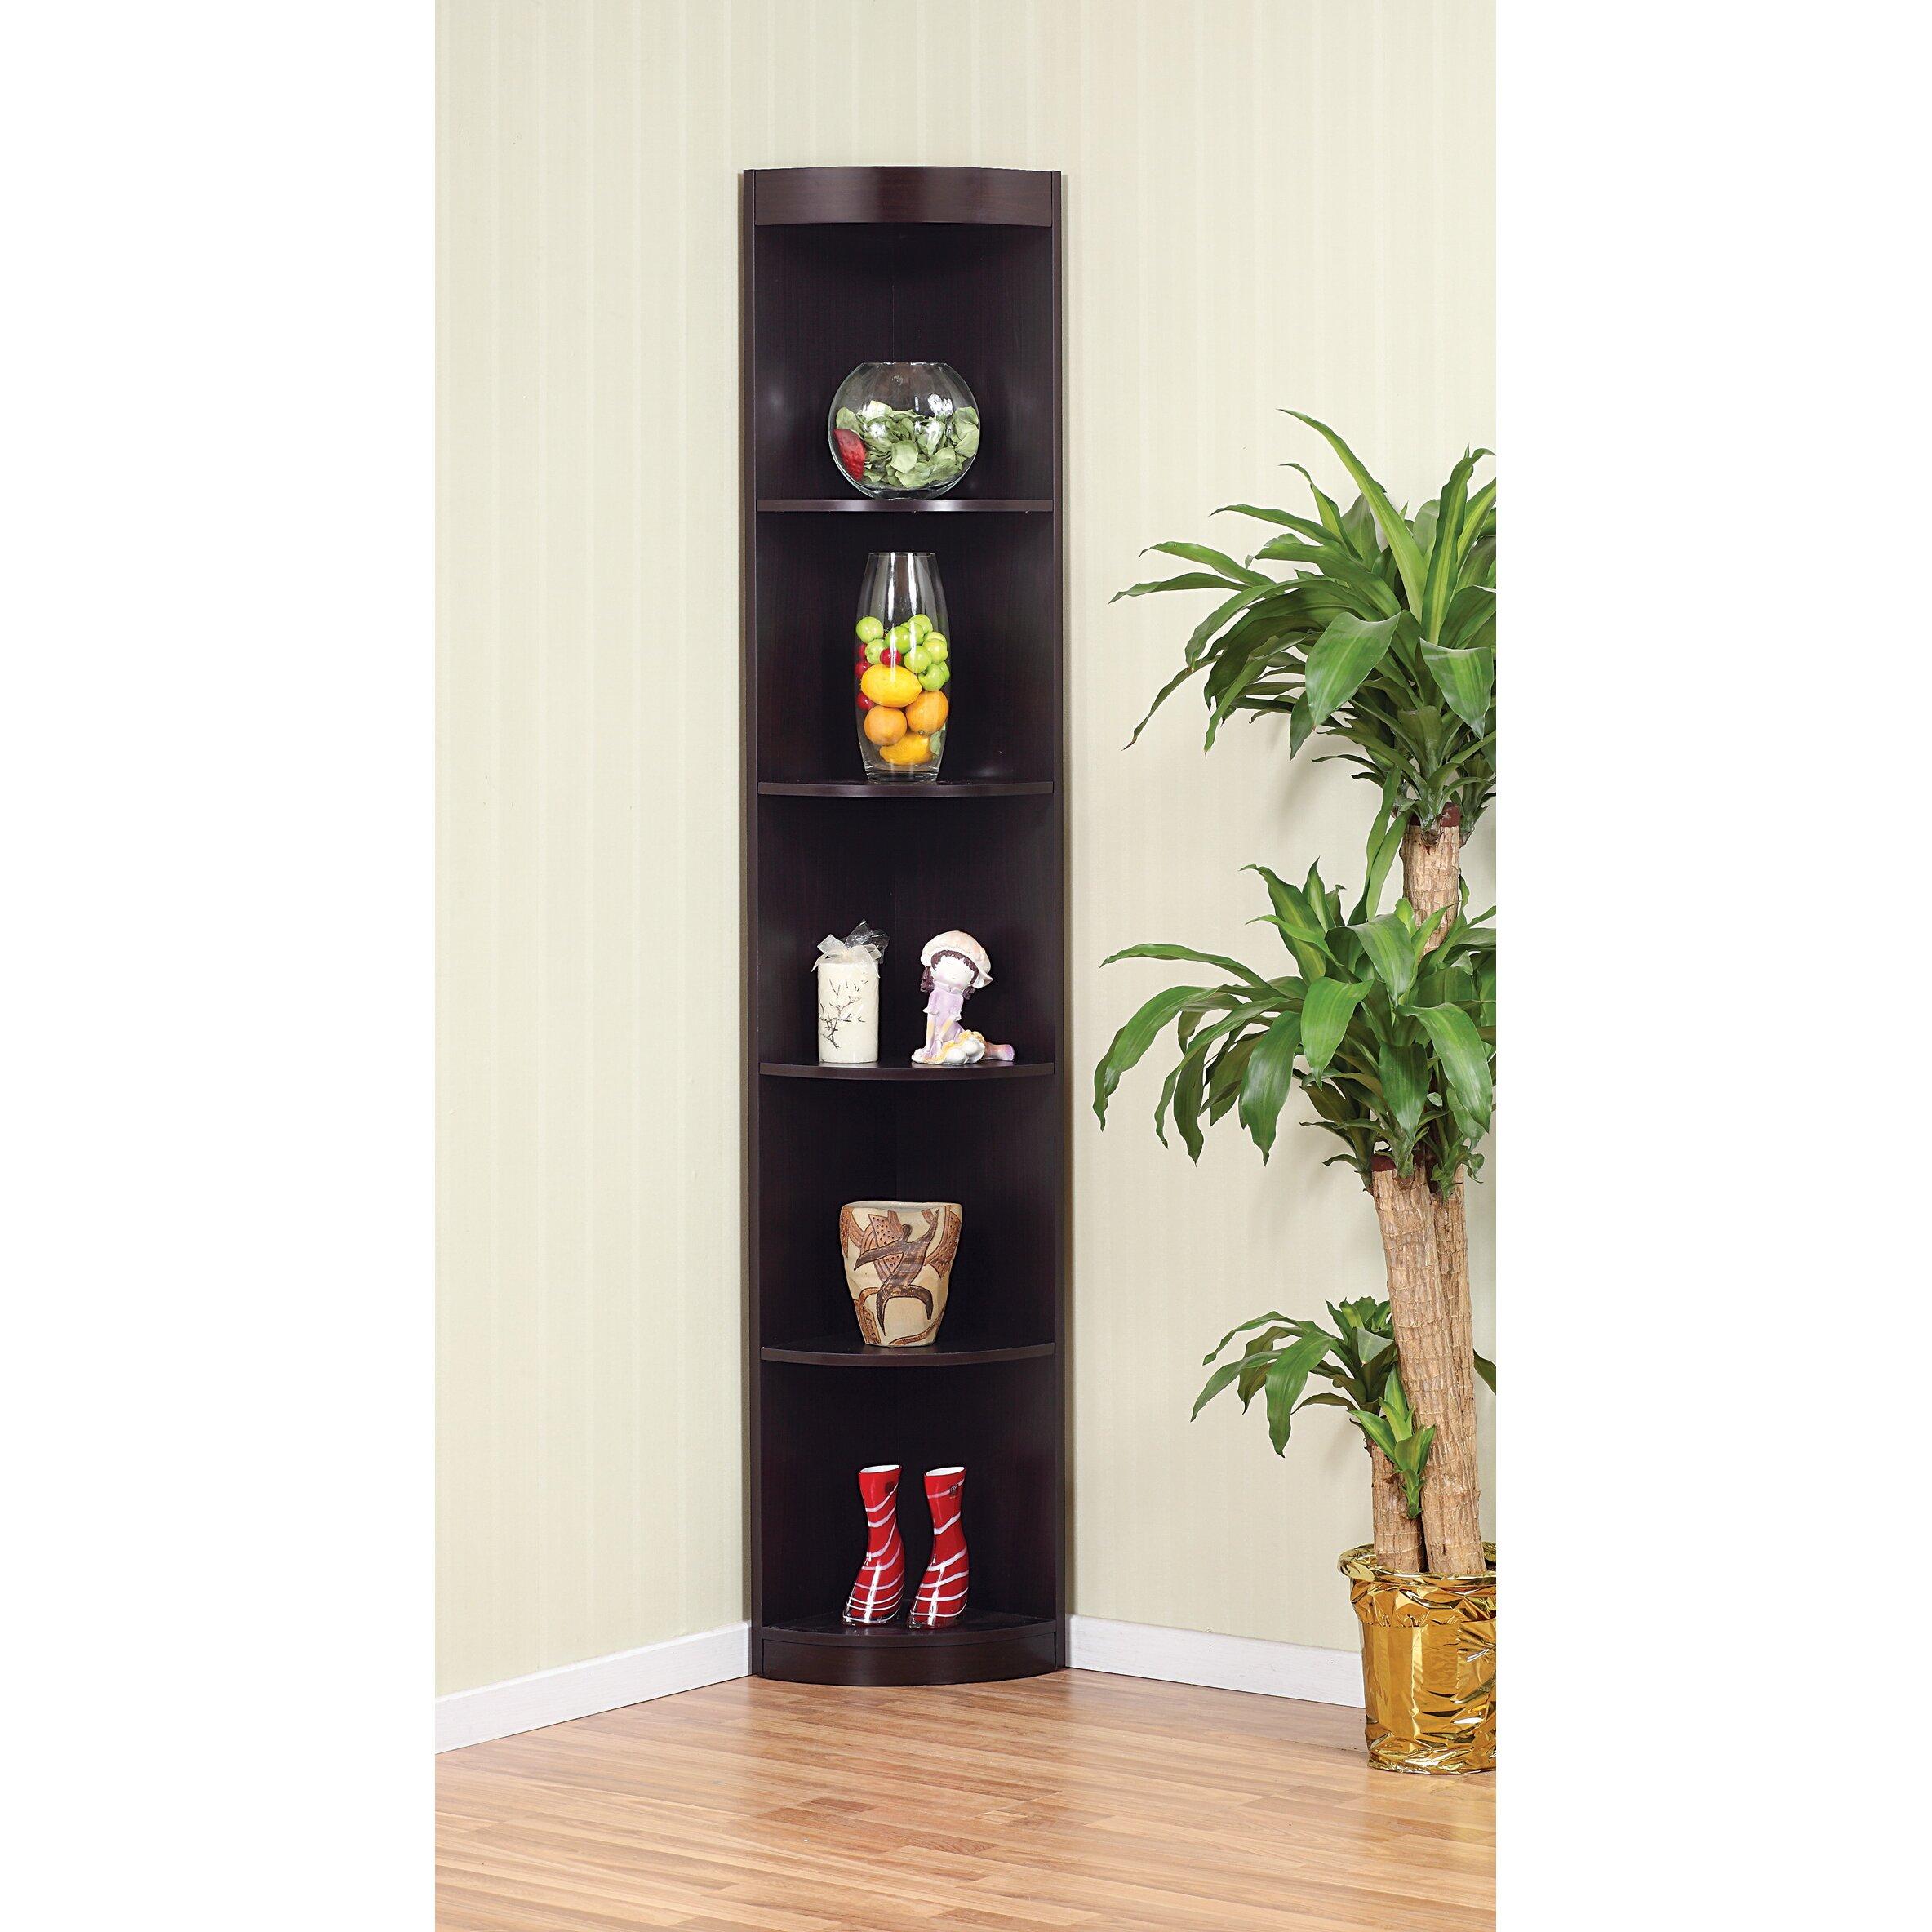 "Living Room Corner Shelf: Red Barrel Studio Fuhrmann 77"" Corner Unit Bookcase"